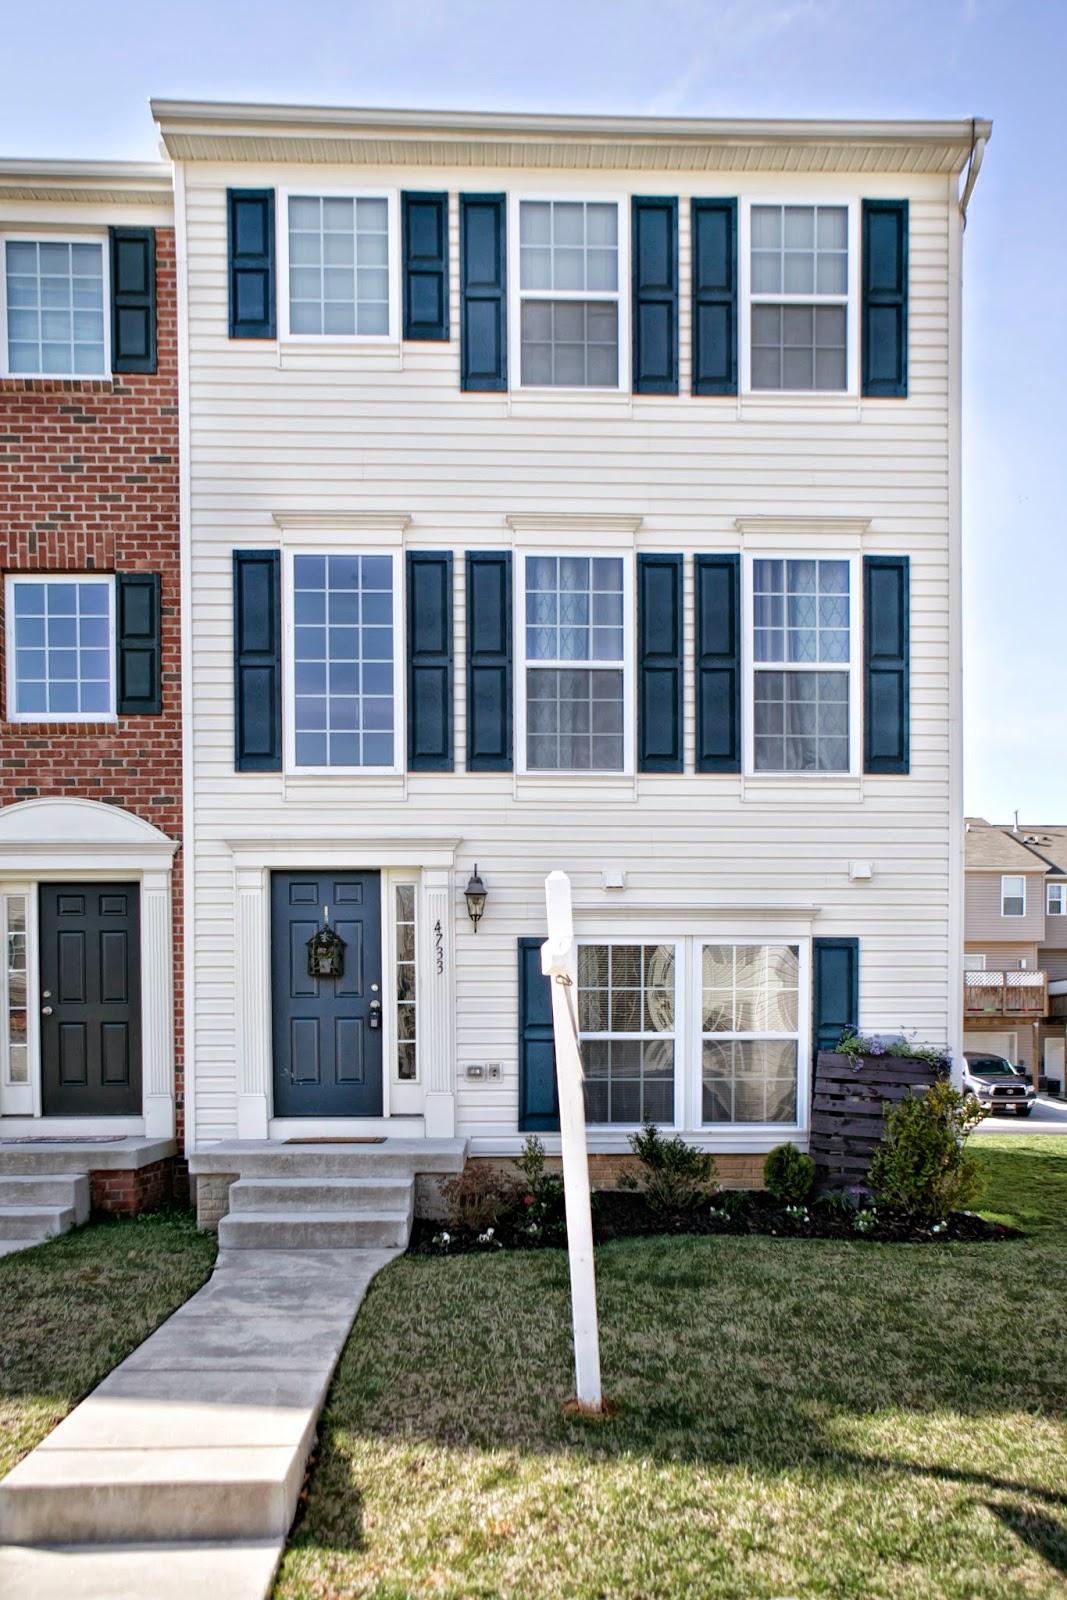 http://www.buy-sellmdhomes.com/listing/mlsid/161/propertyid/HR8262521/